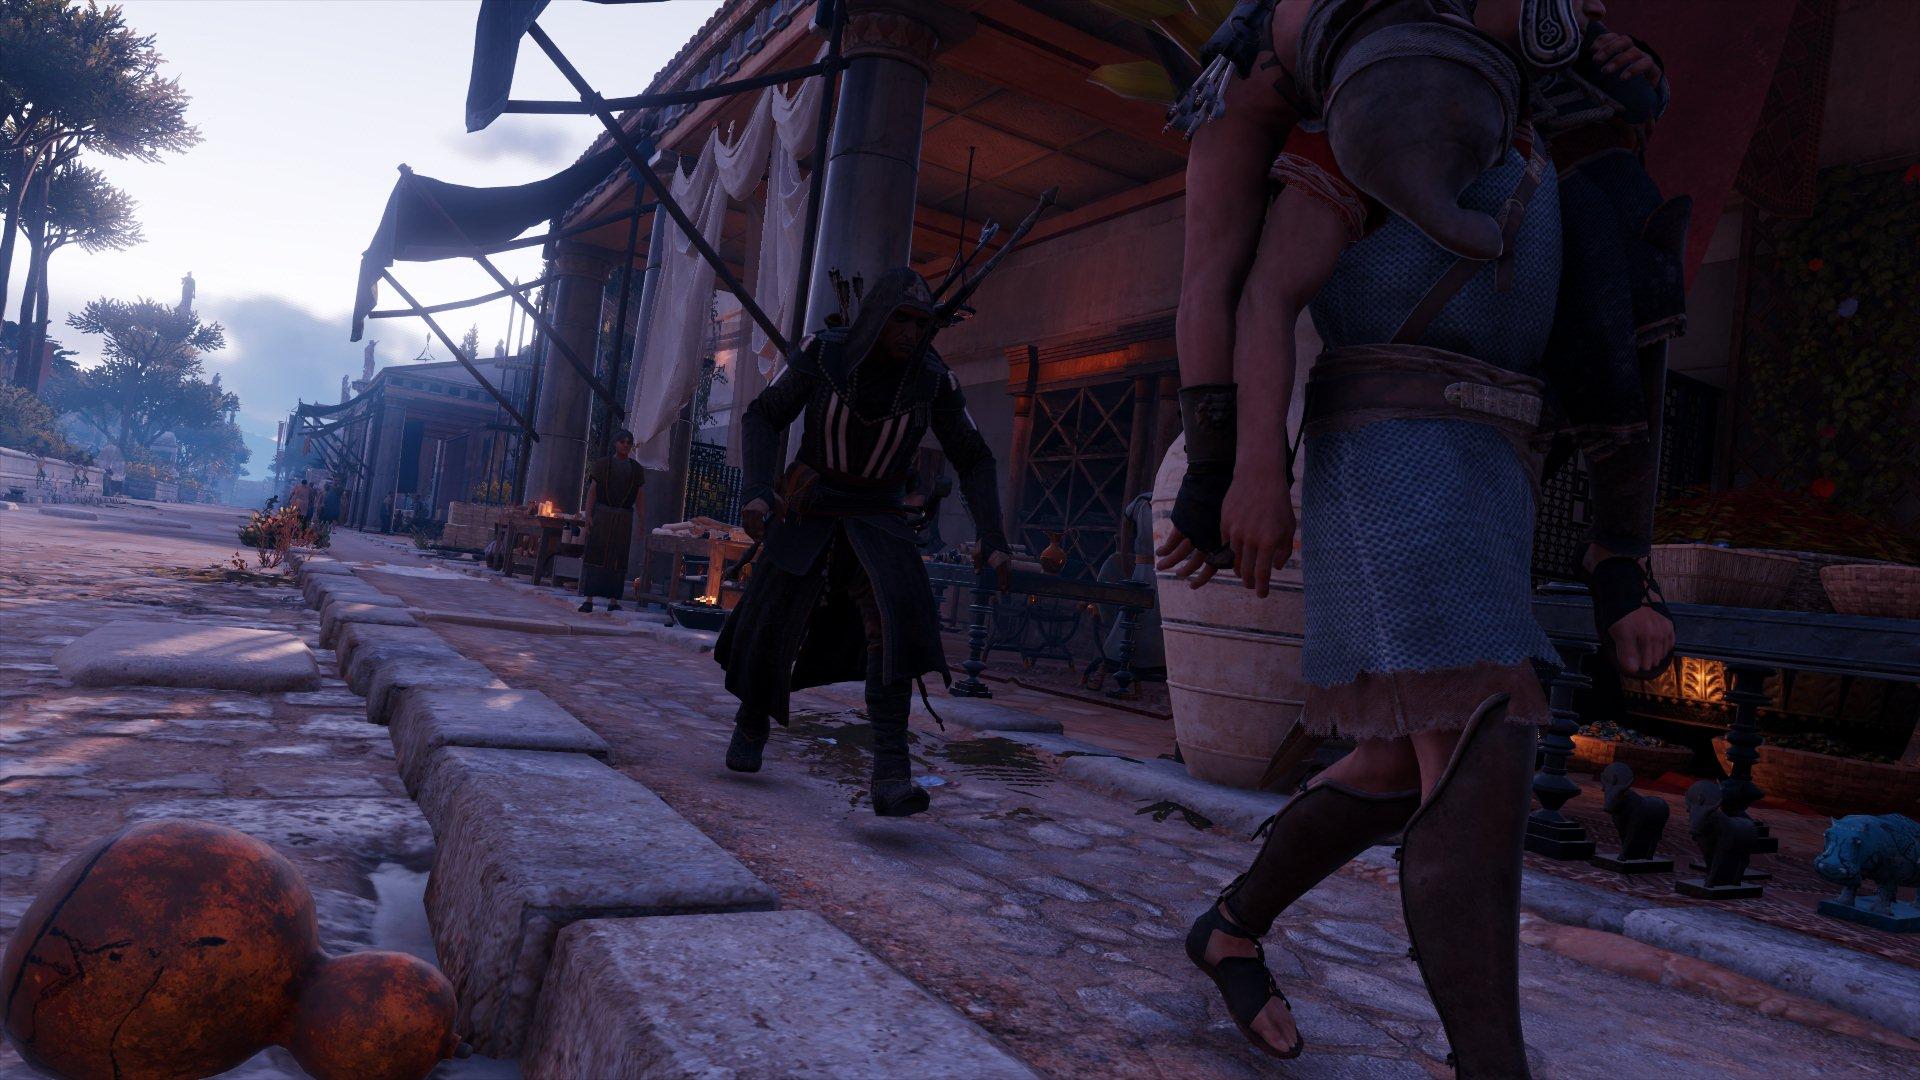 Assassin's Creed® Истоки__47.jpeg - Assassin's Creed: Origins